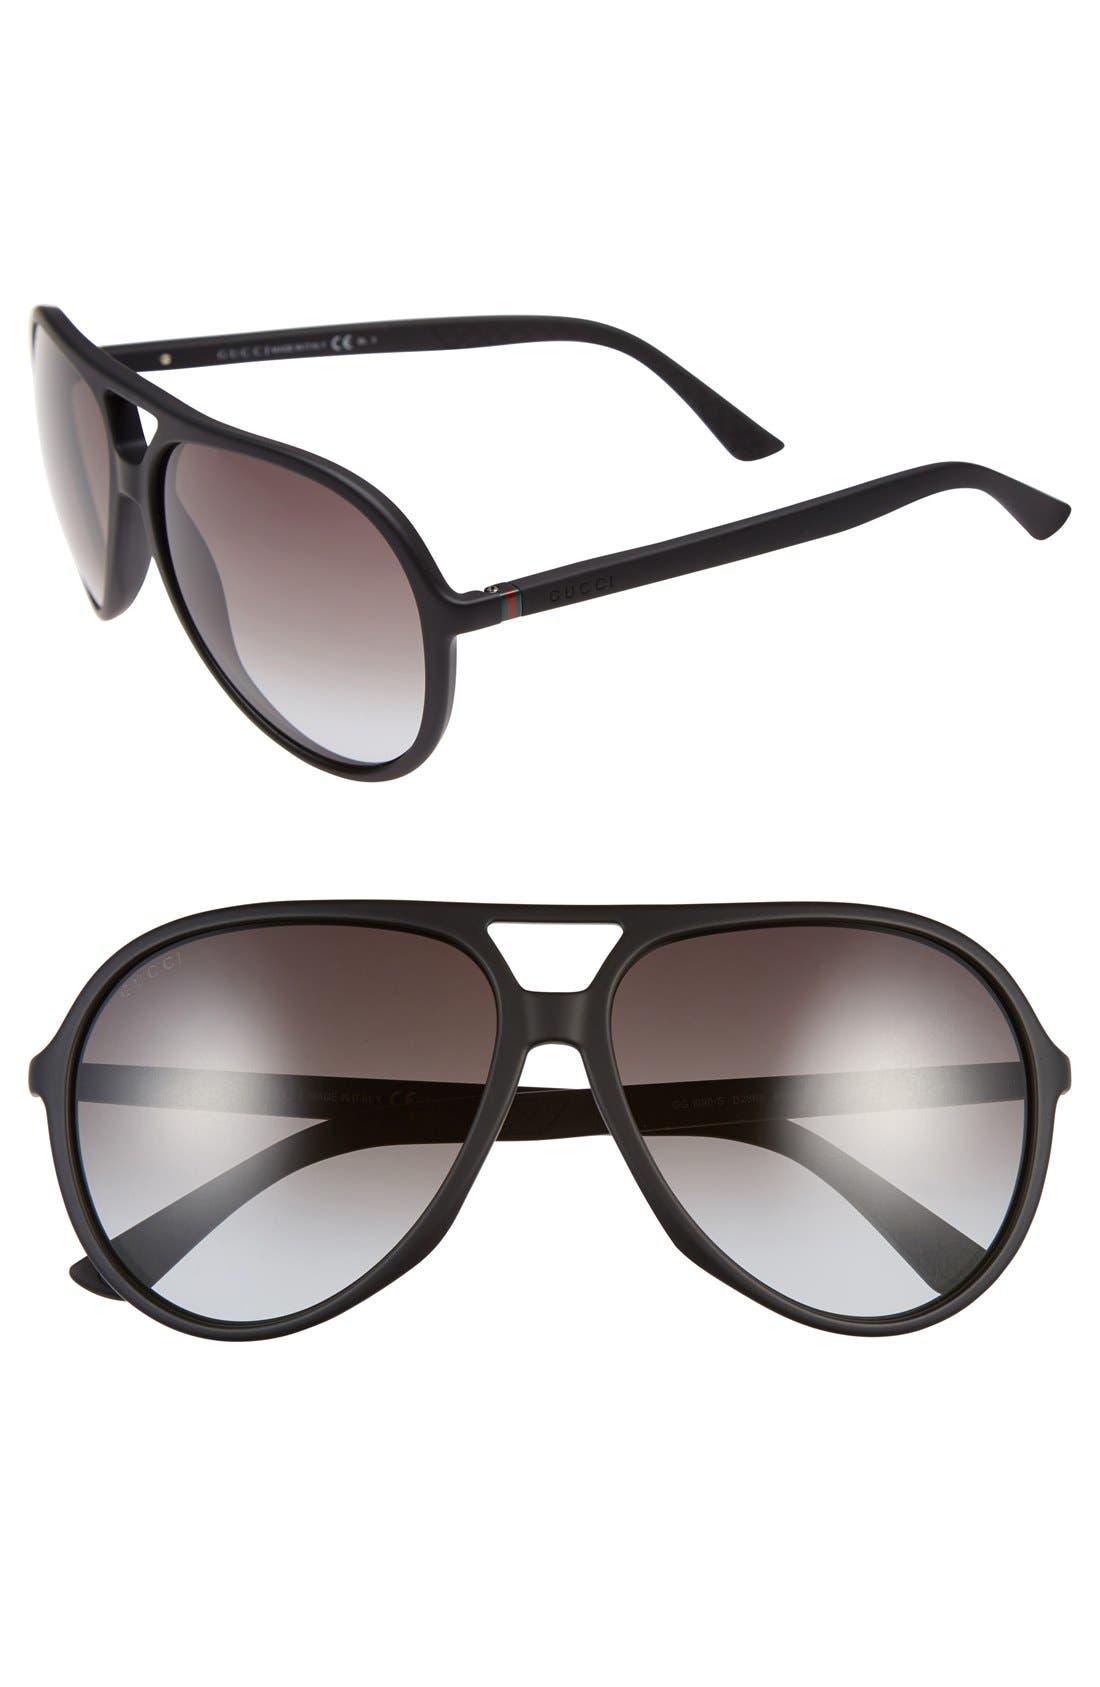 Main Image - Gucci 61mm Aviator Sunglasses